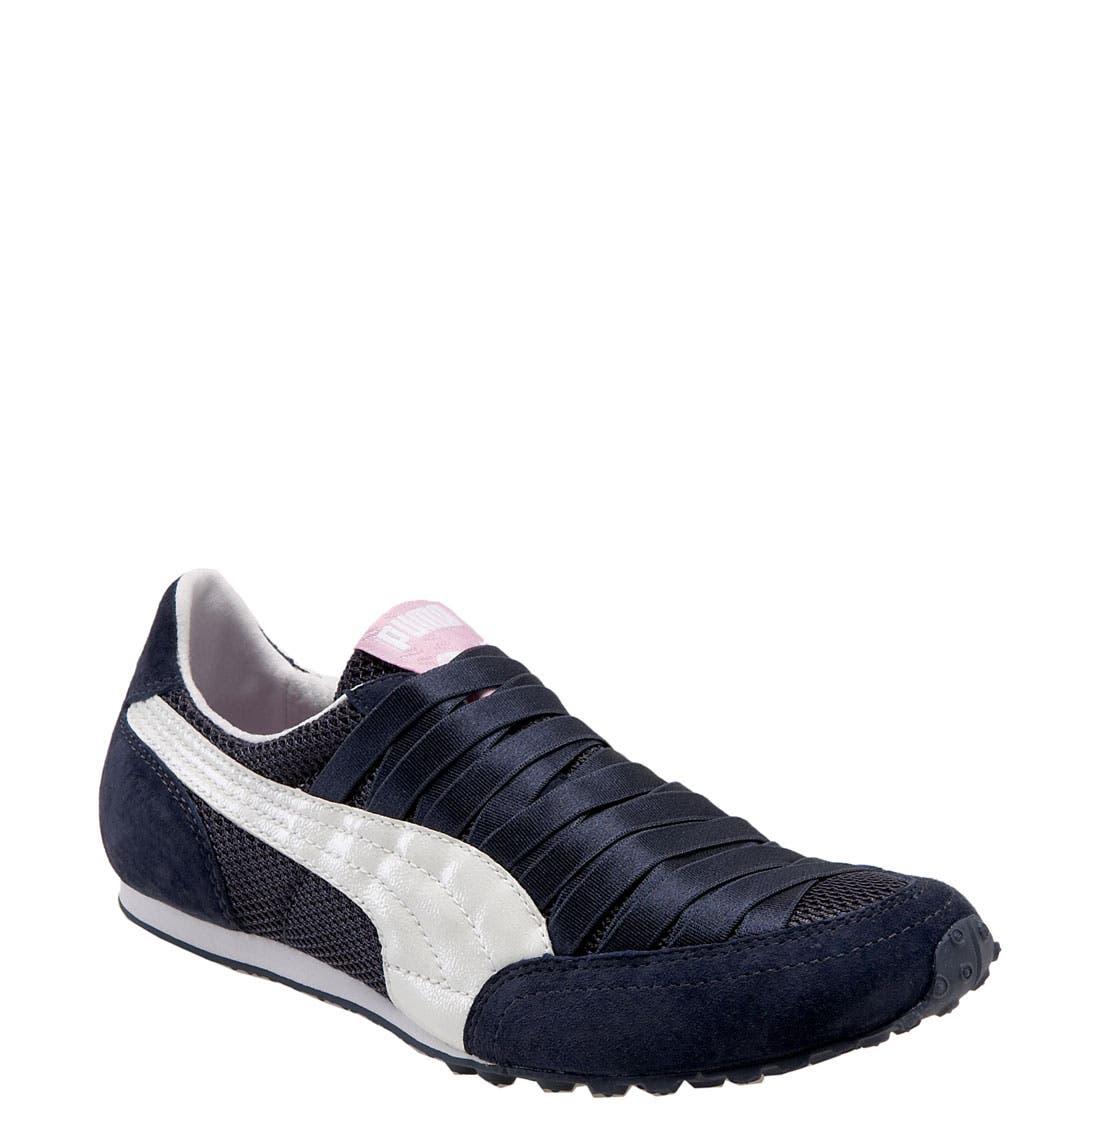 Main Image - Puma 'Imani' Slip-On Sneaker